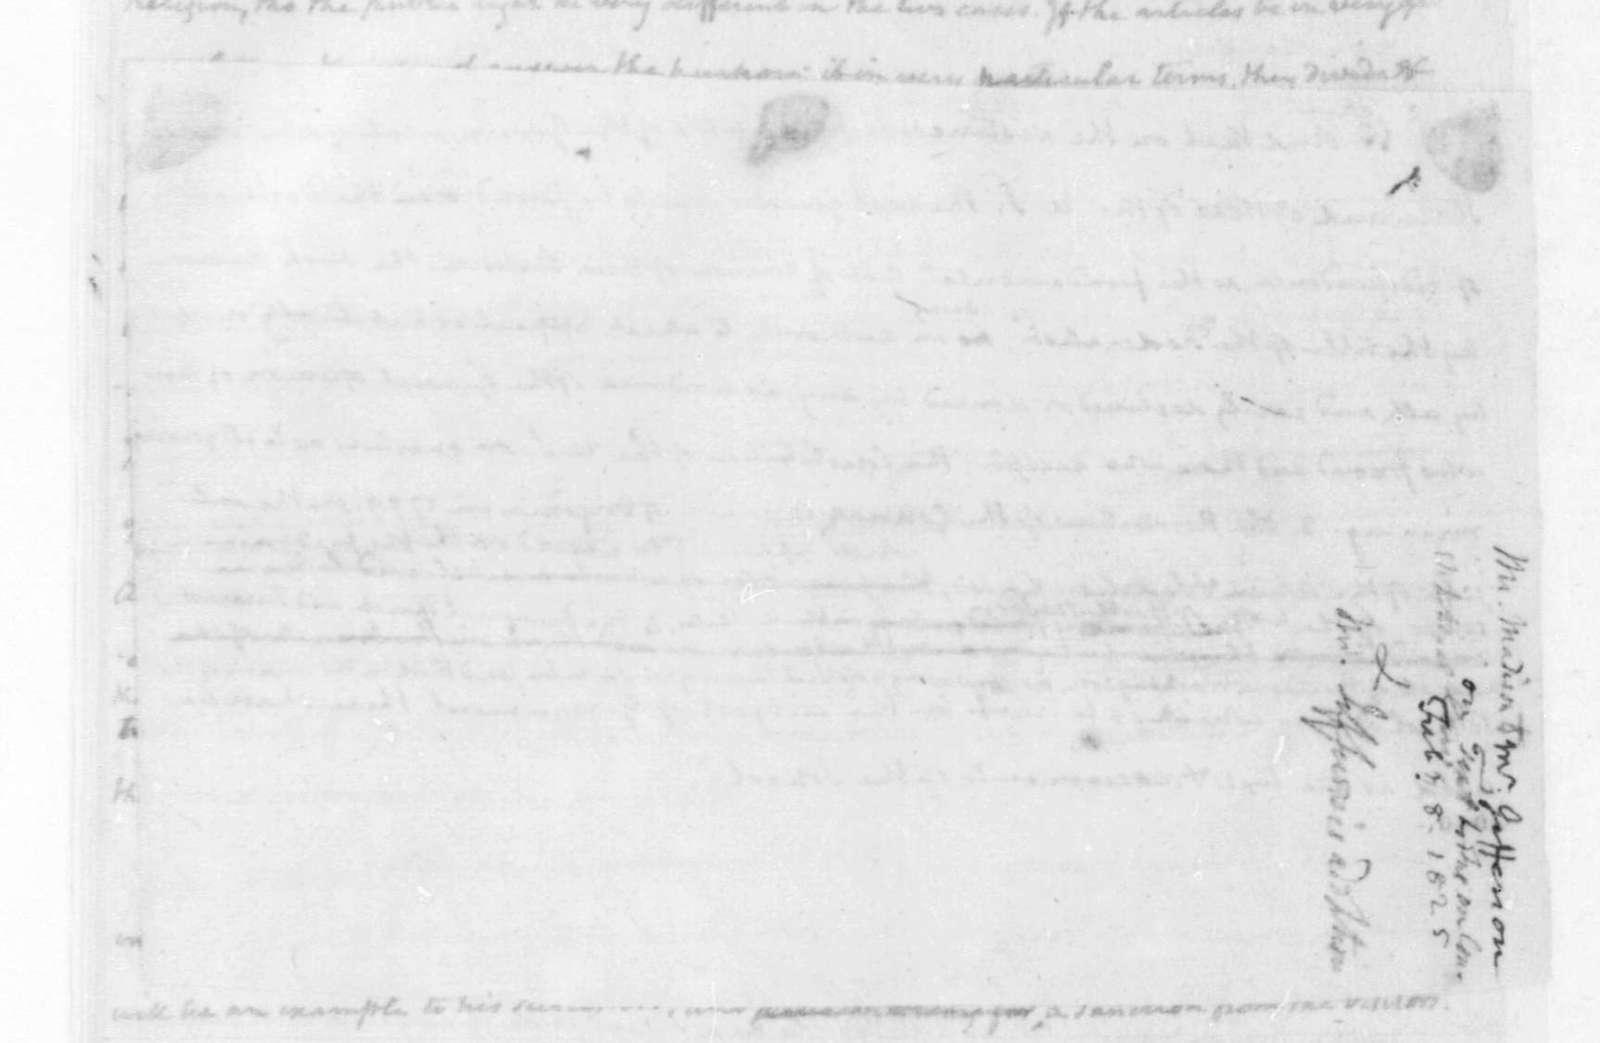 James Madison to Thomas Jefferson, February 8, 1825. With written sketch.